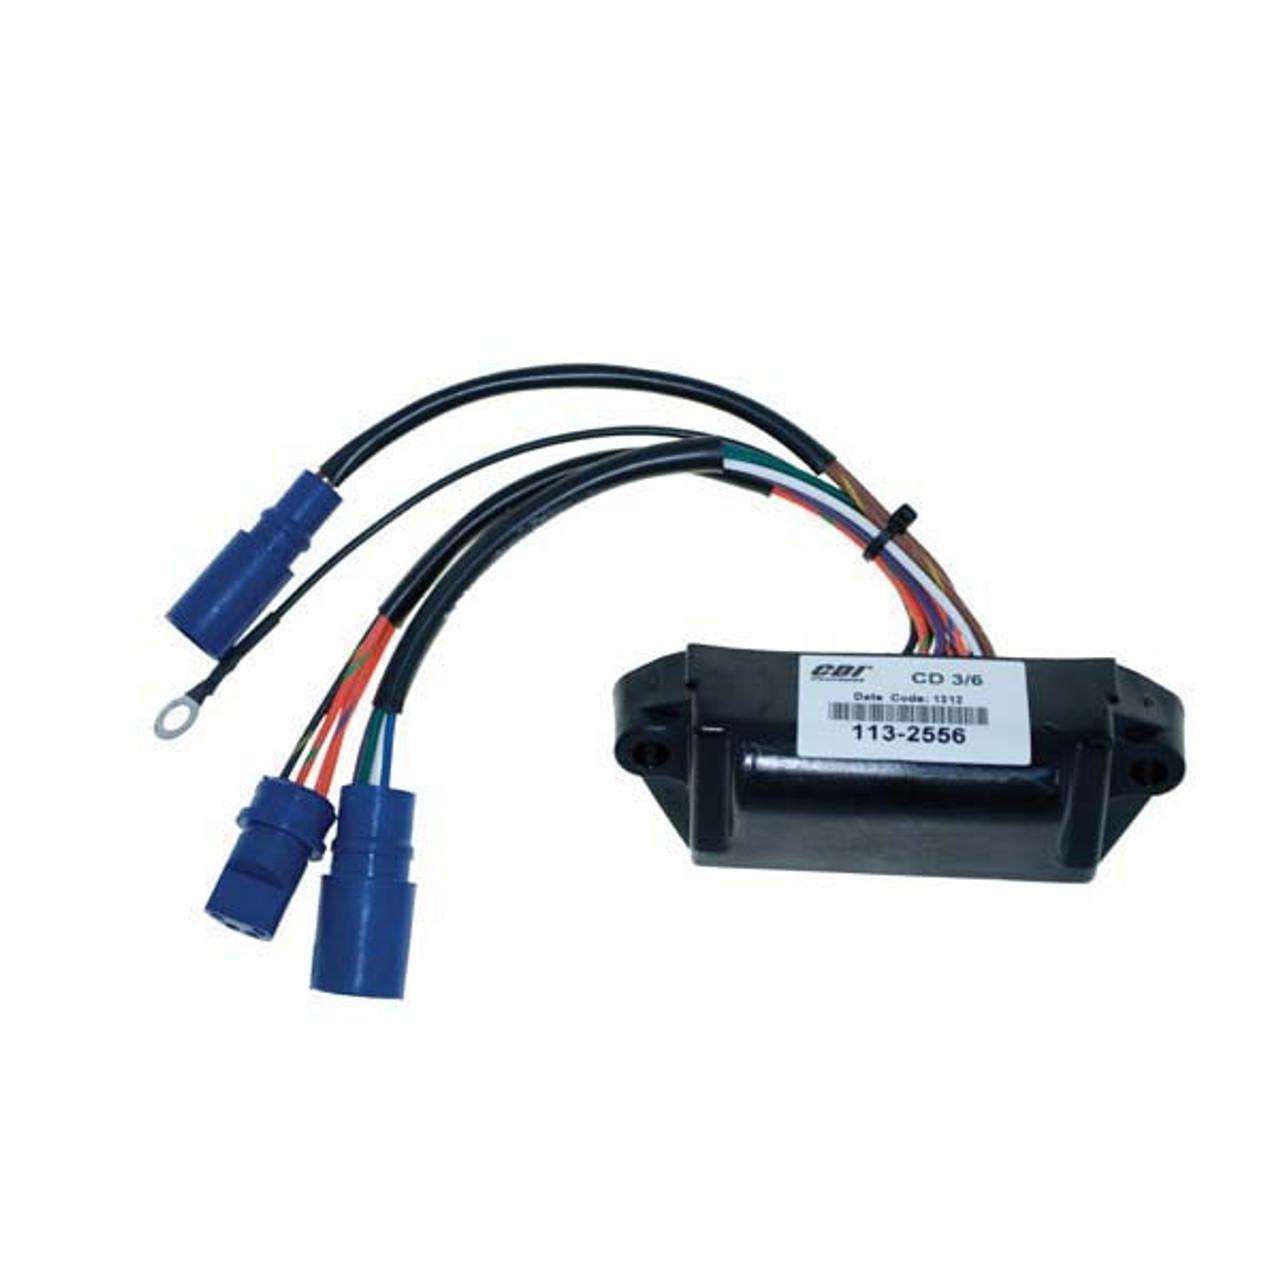 Sierra 18-5774 Power Pack for Johnson//Evinrude Outboard Motors OMC 585145